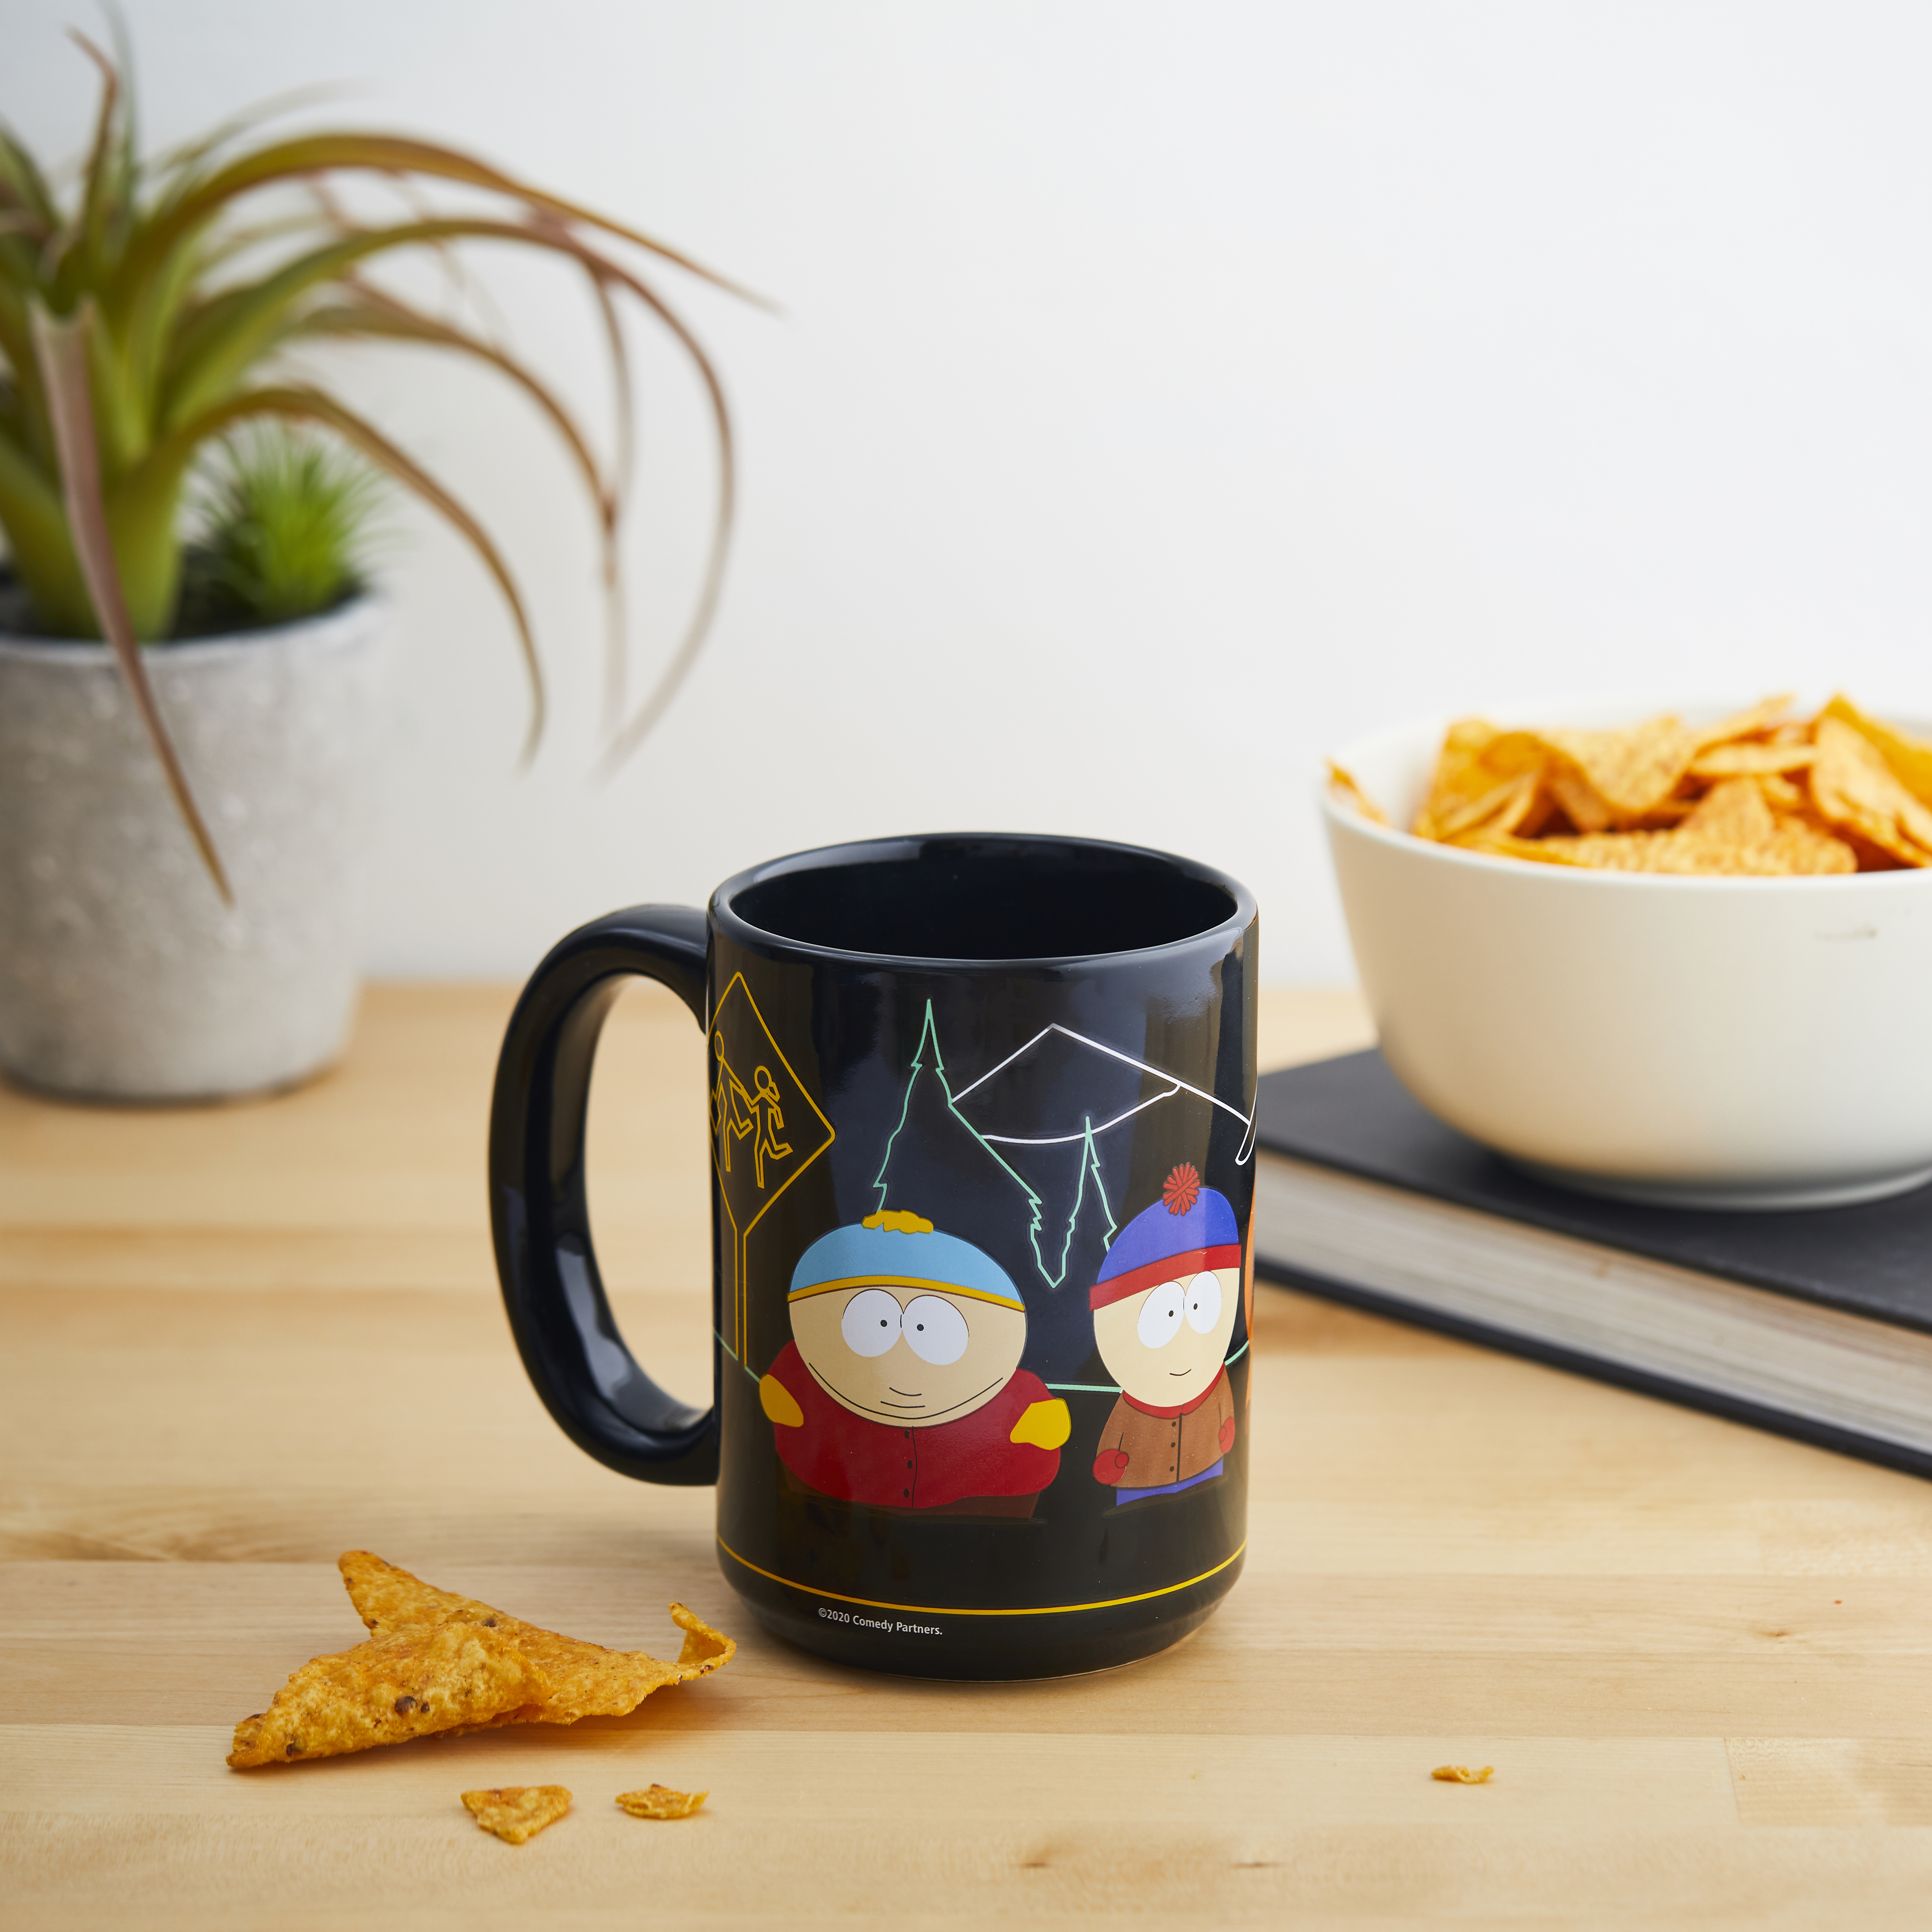 South Park 15 ounce Coffee Mug, Cartman, Kenny & Kyle slideshow image 4